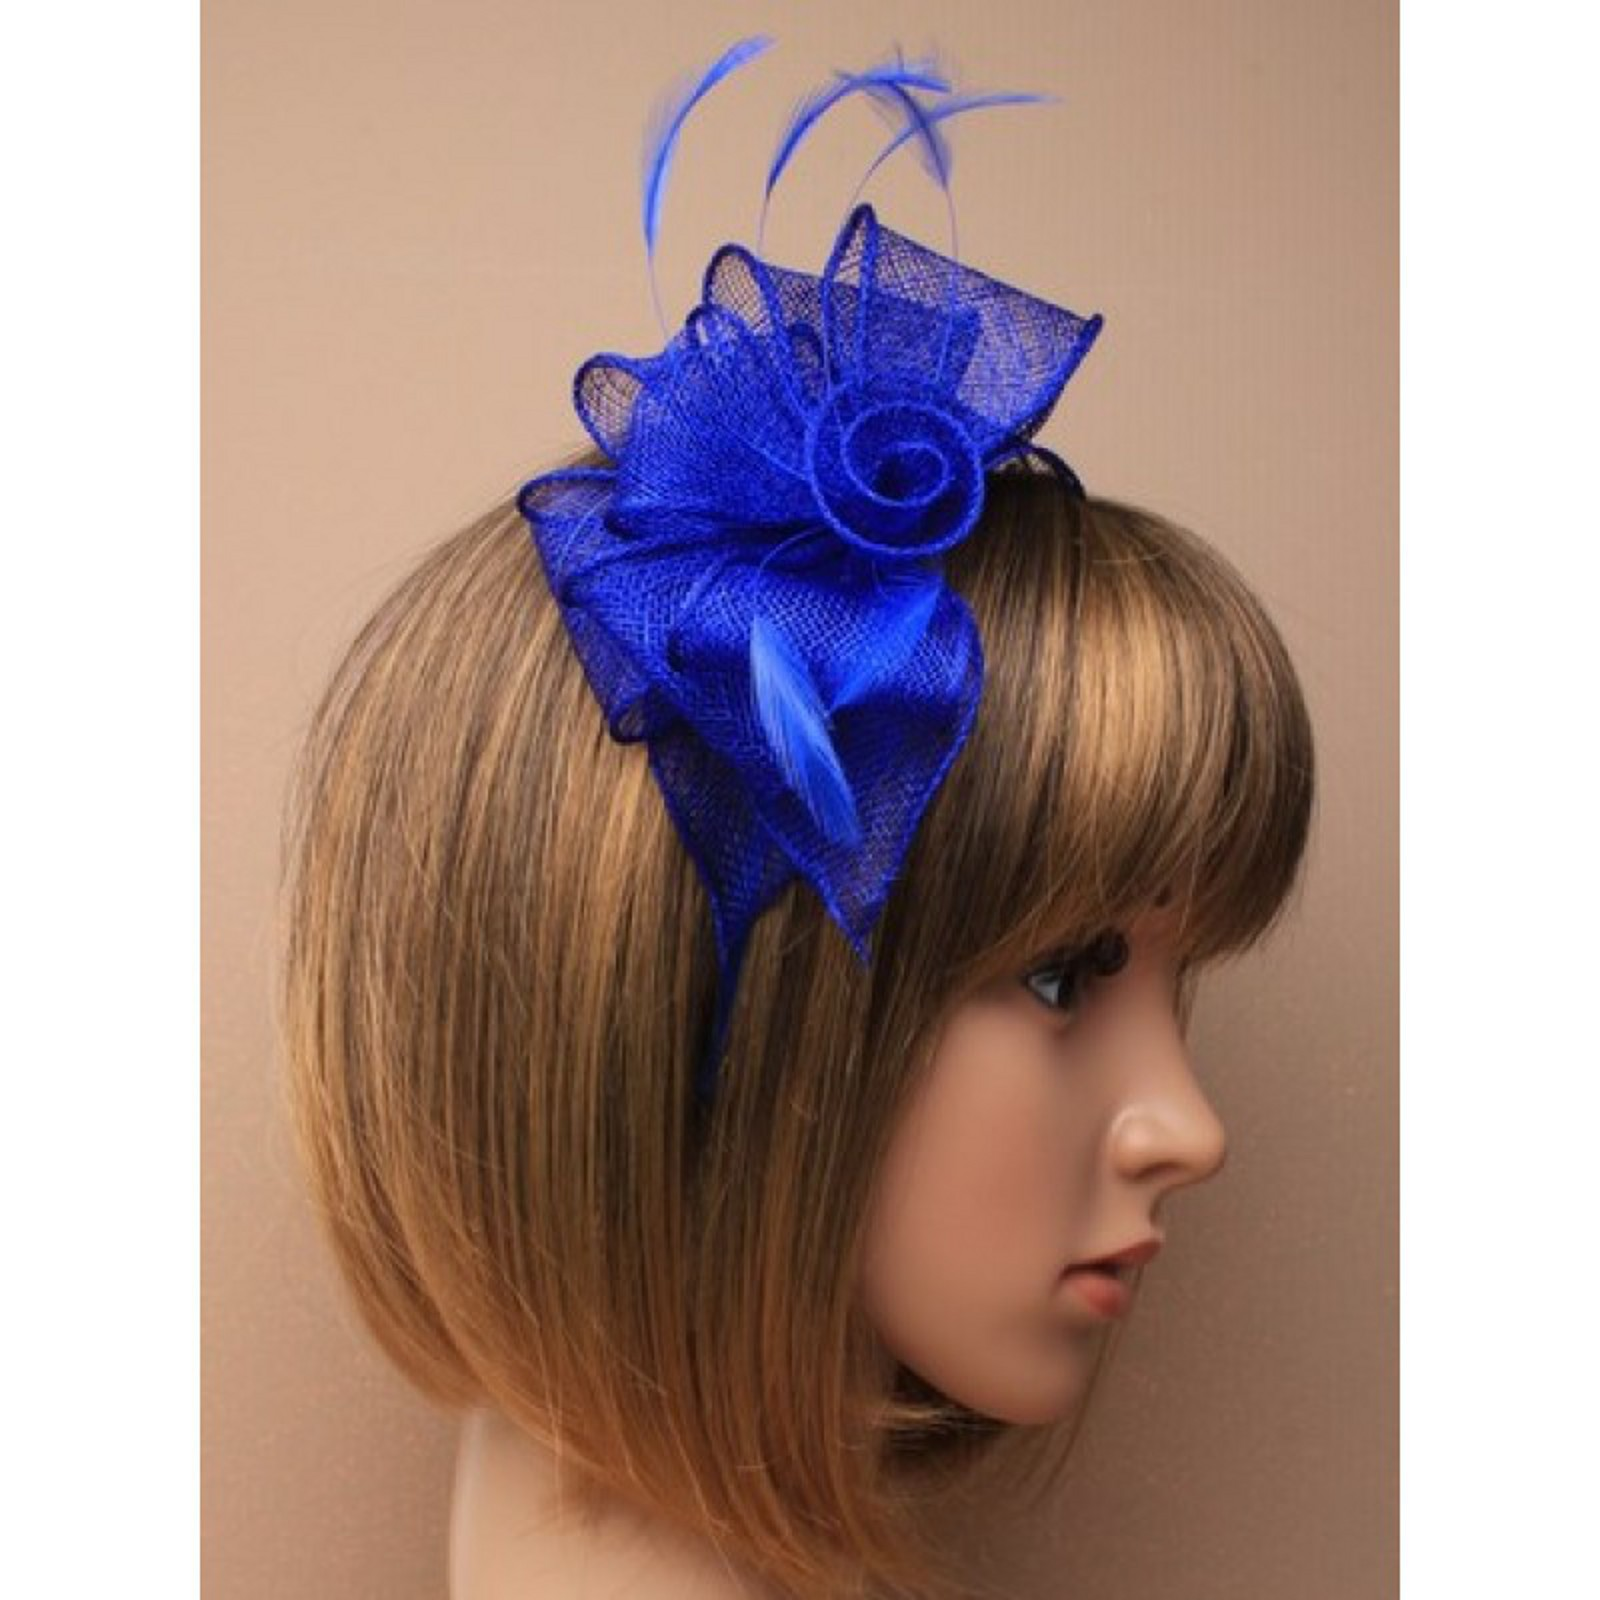 Arranview-5918-1-blue-fascinator